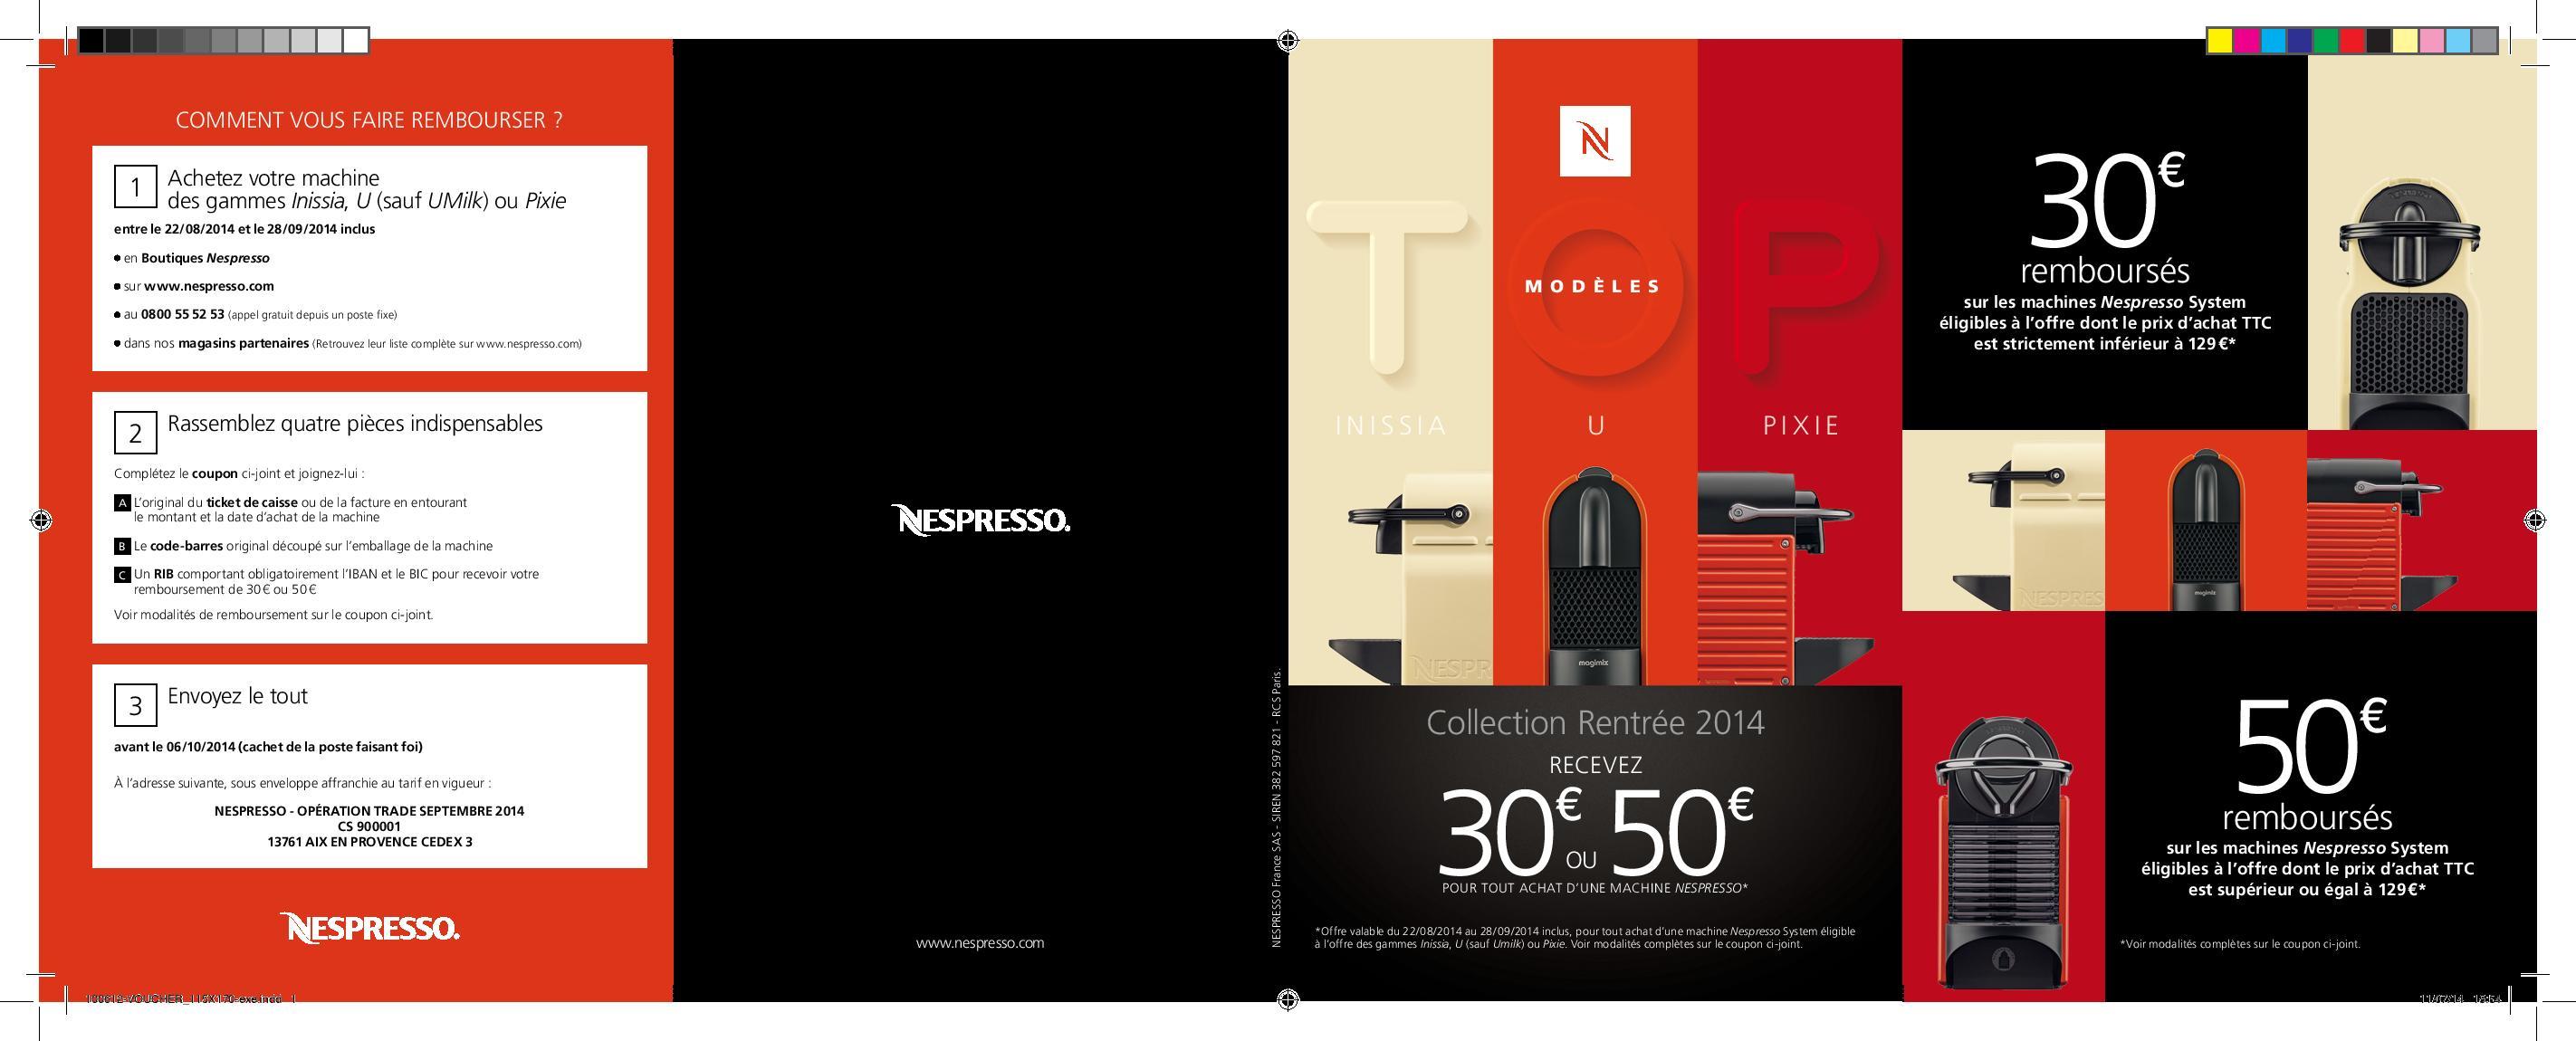 offre de remboursement odr nespresso jusqu 50 sur votre machine caf. Black Bedroom Furniture Sets. Home Design Ideas